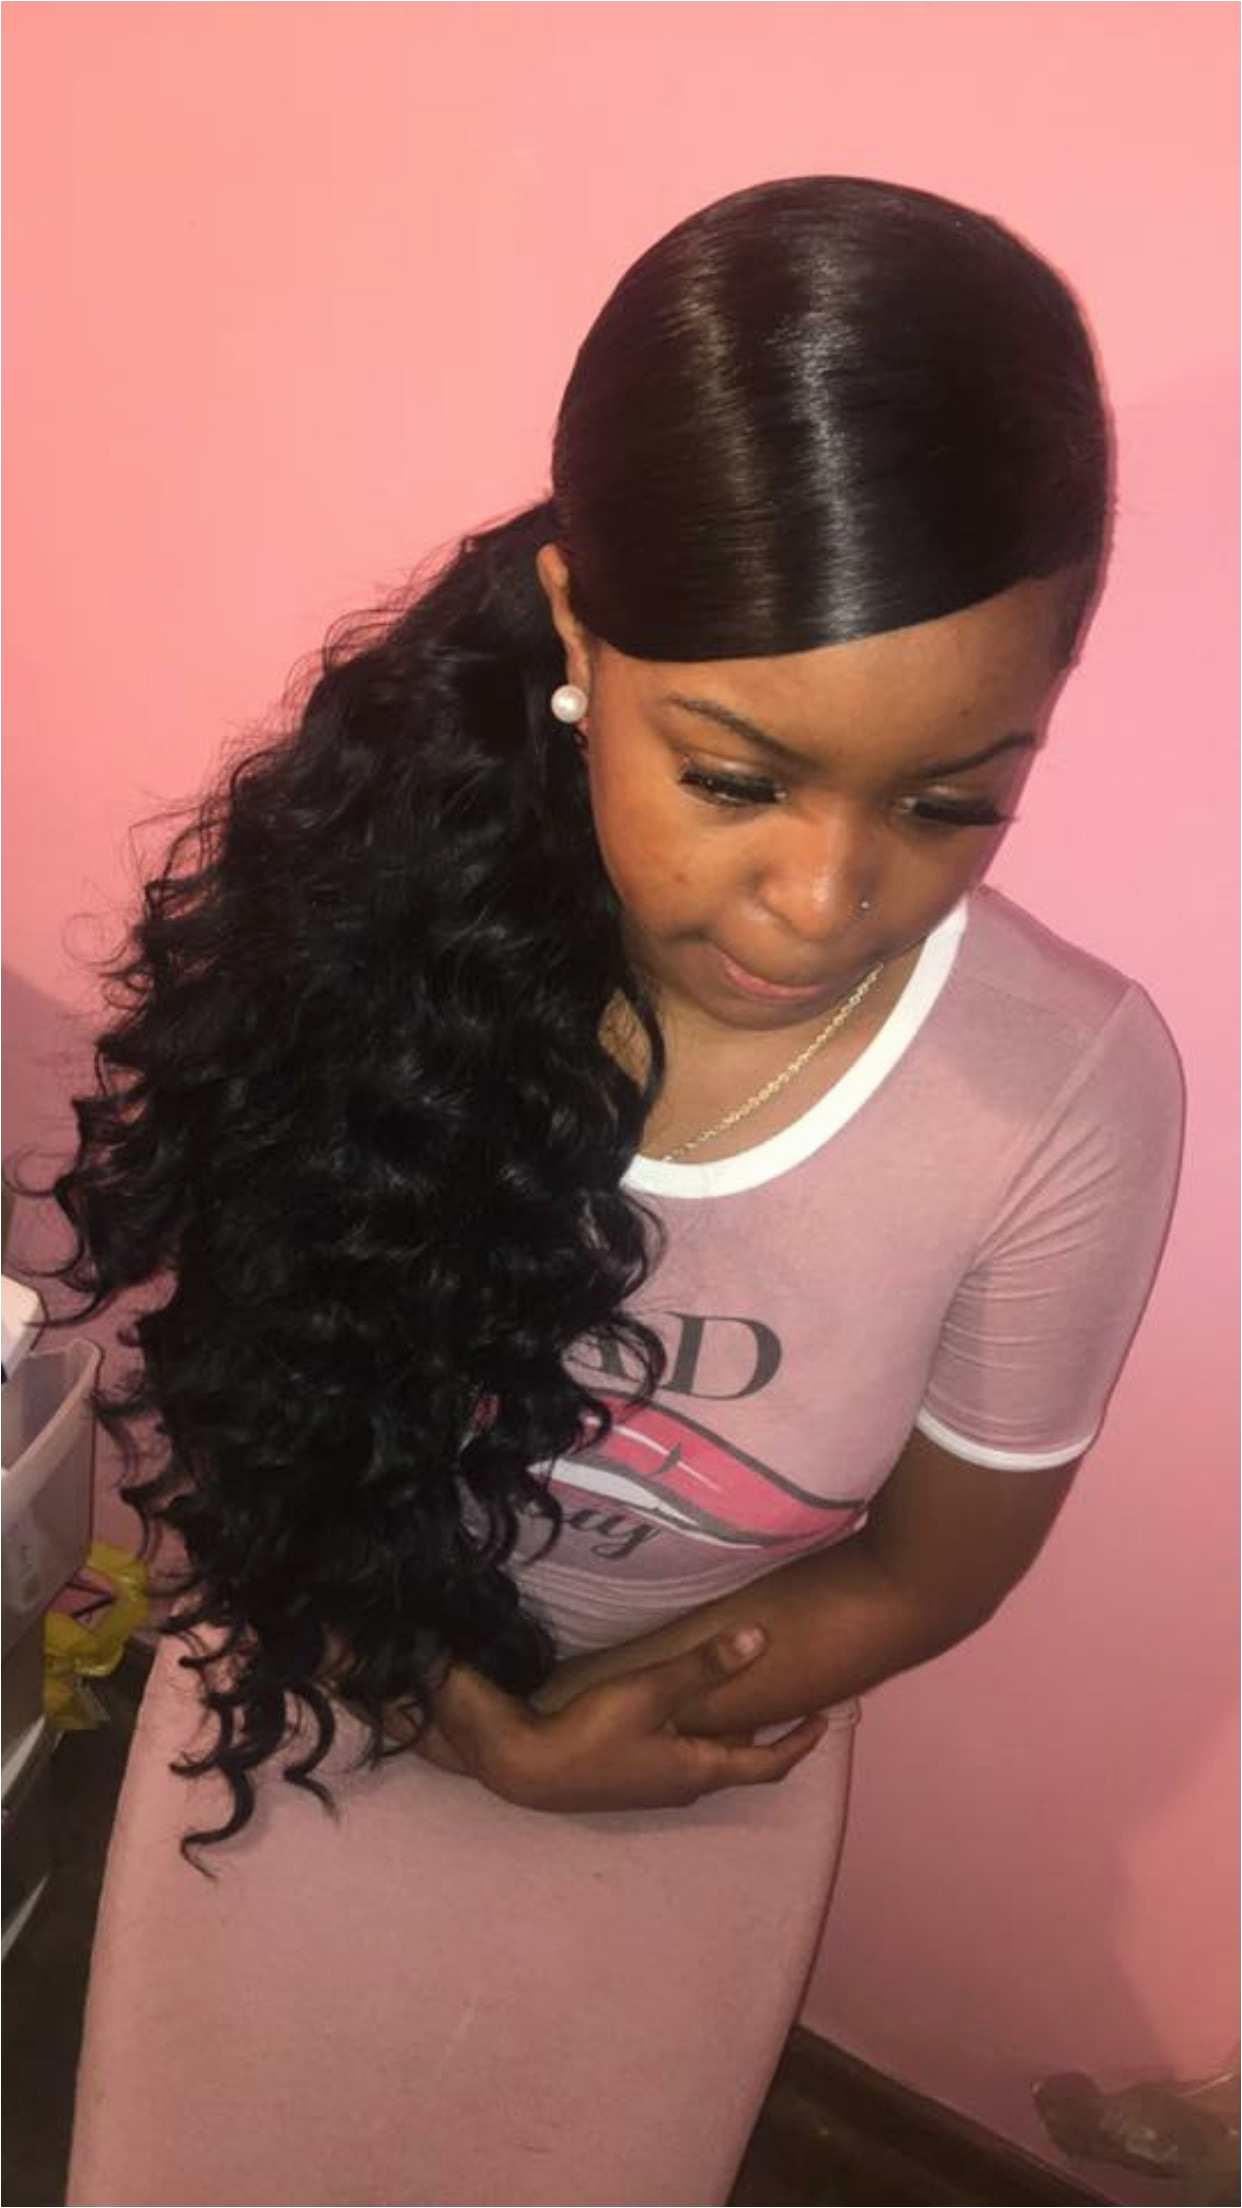 Micro Hairstyles Picture Hair Color Supplies Fresh Big Braids Hairstyles Fresh Micro Ideas